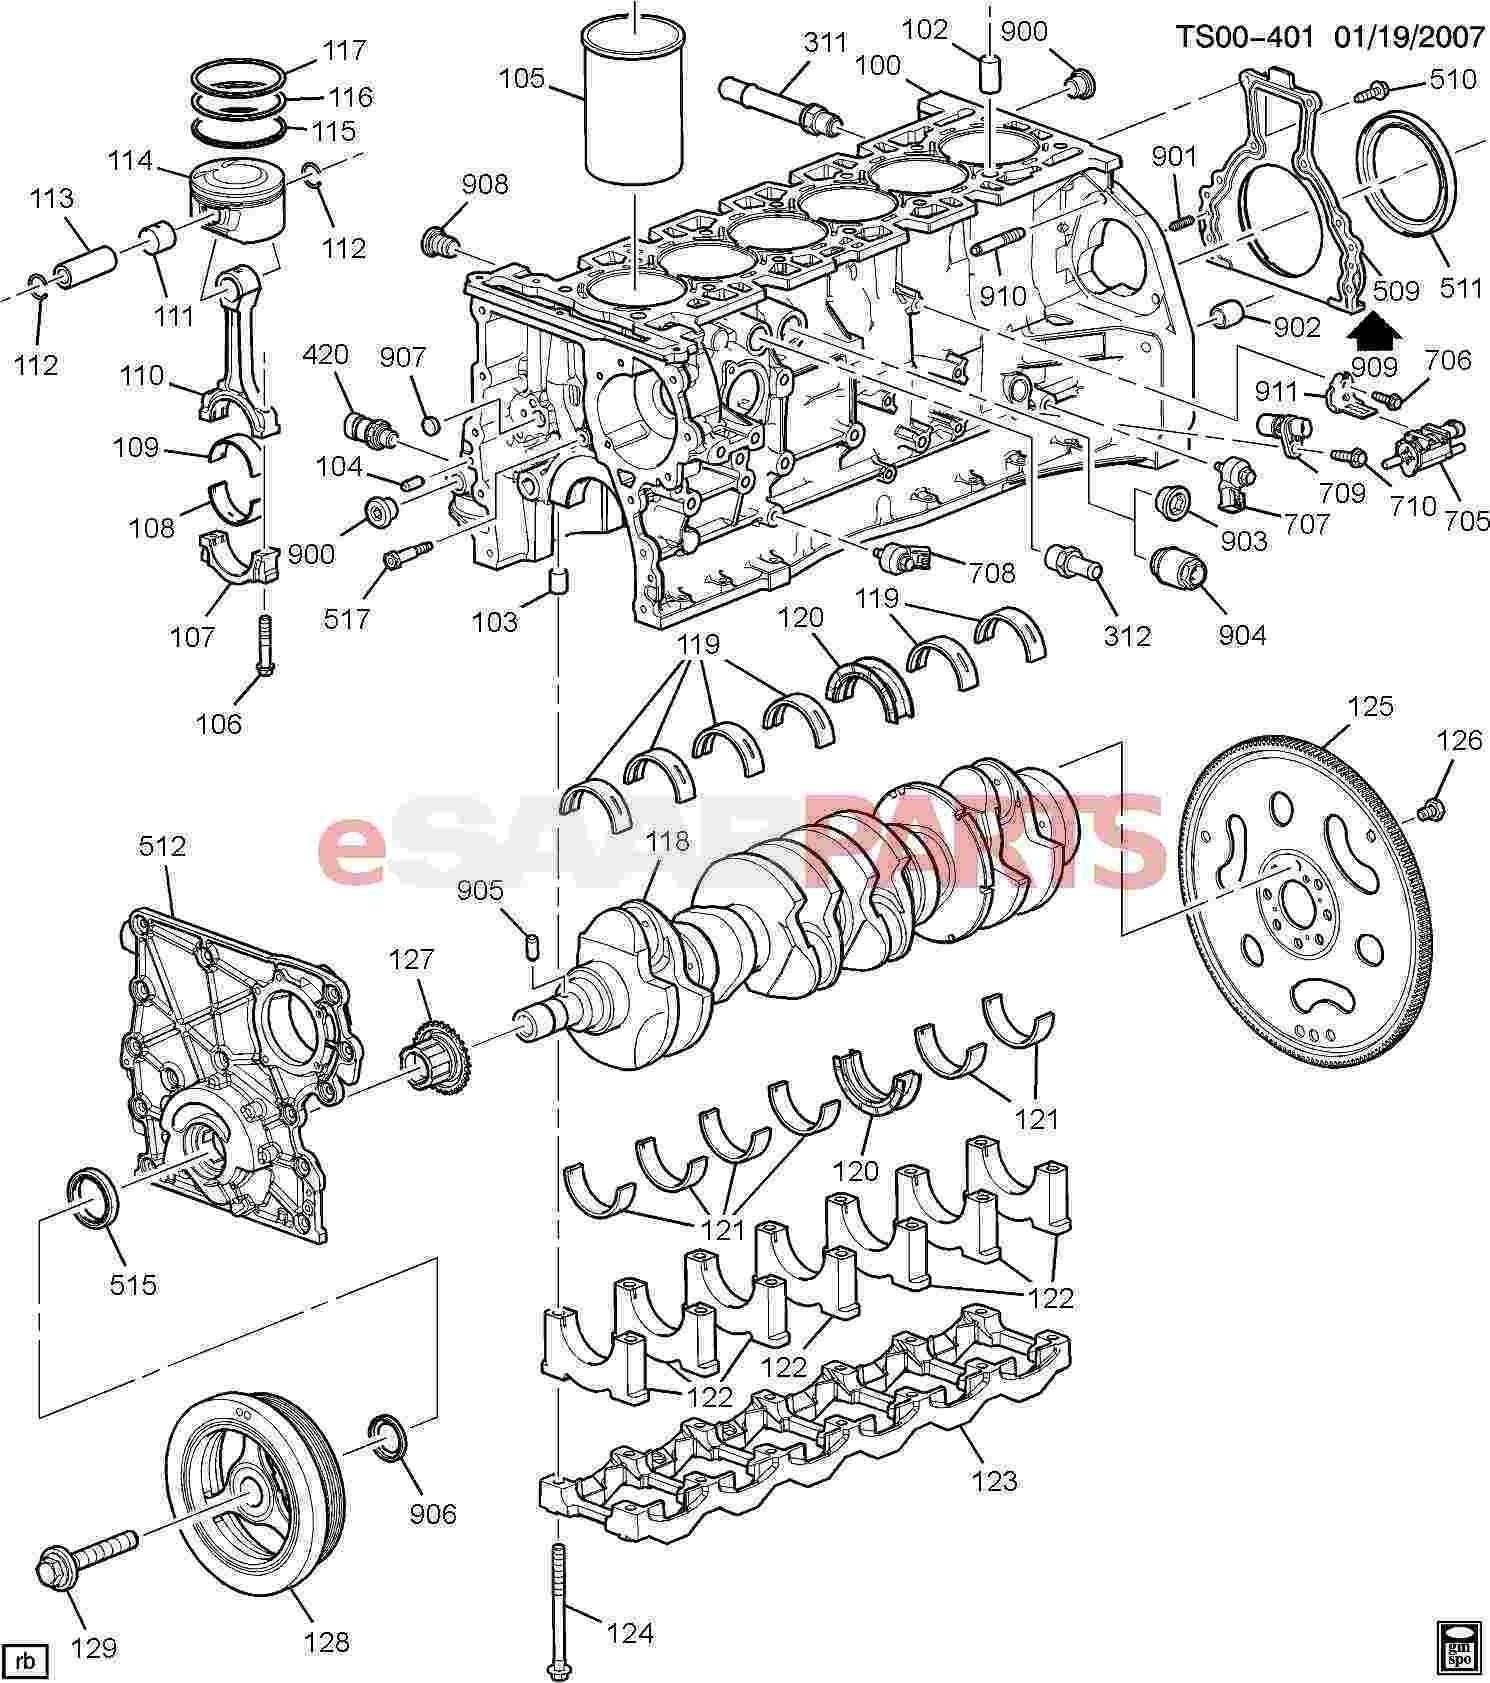 Chevy 3 1 Engine Diagram Blazer Relay Wiring Diagram Inspirationa 2003 Chevy Blazer Engine